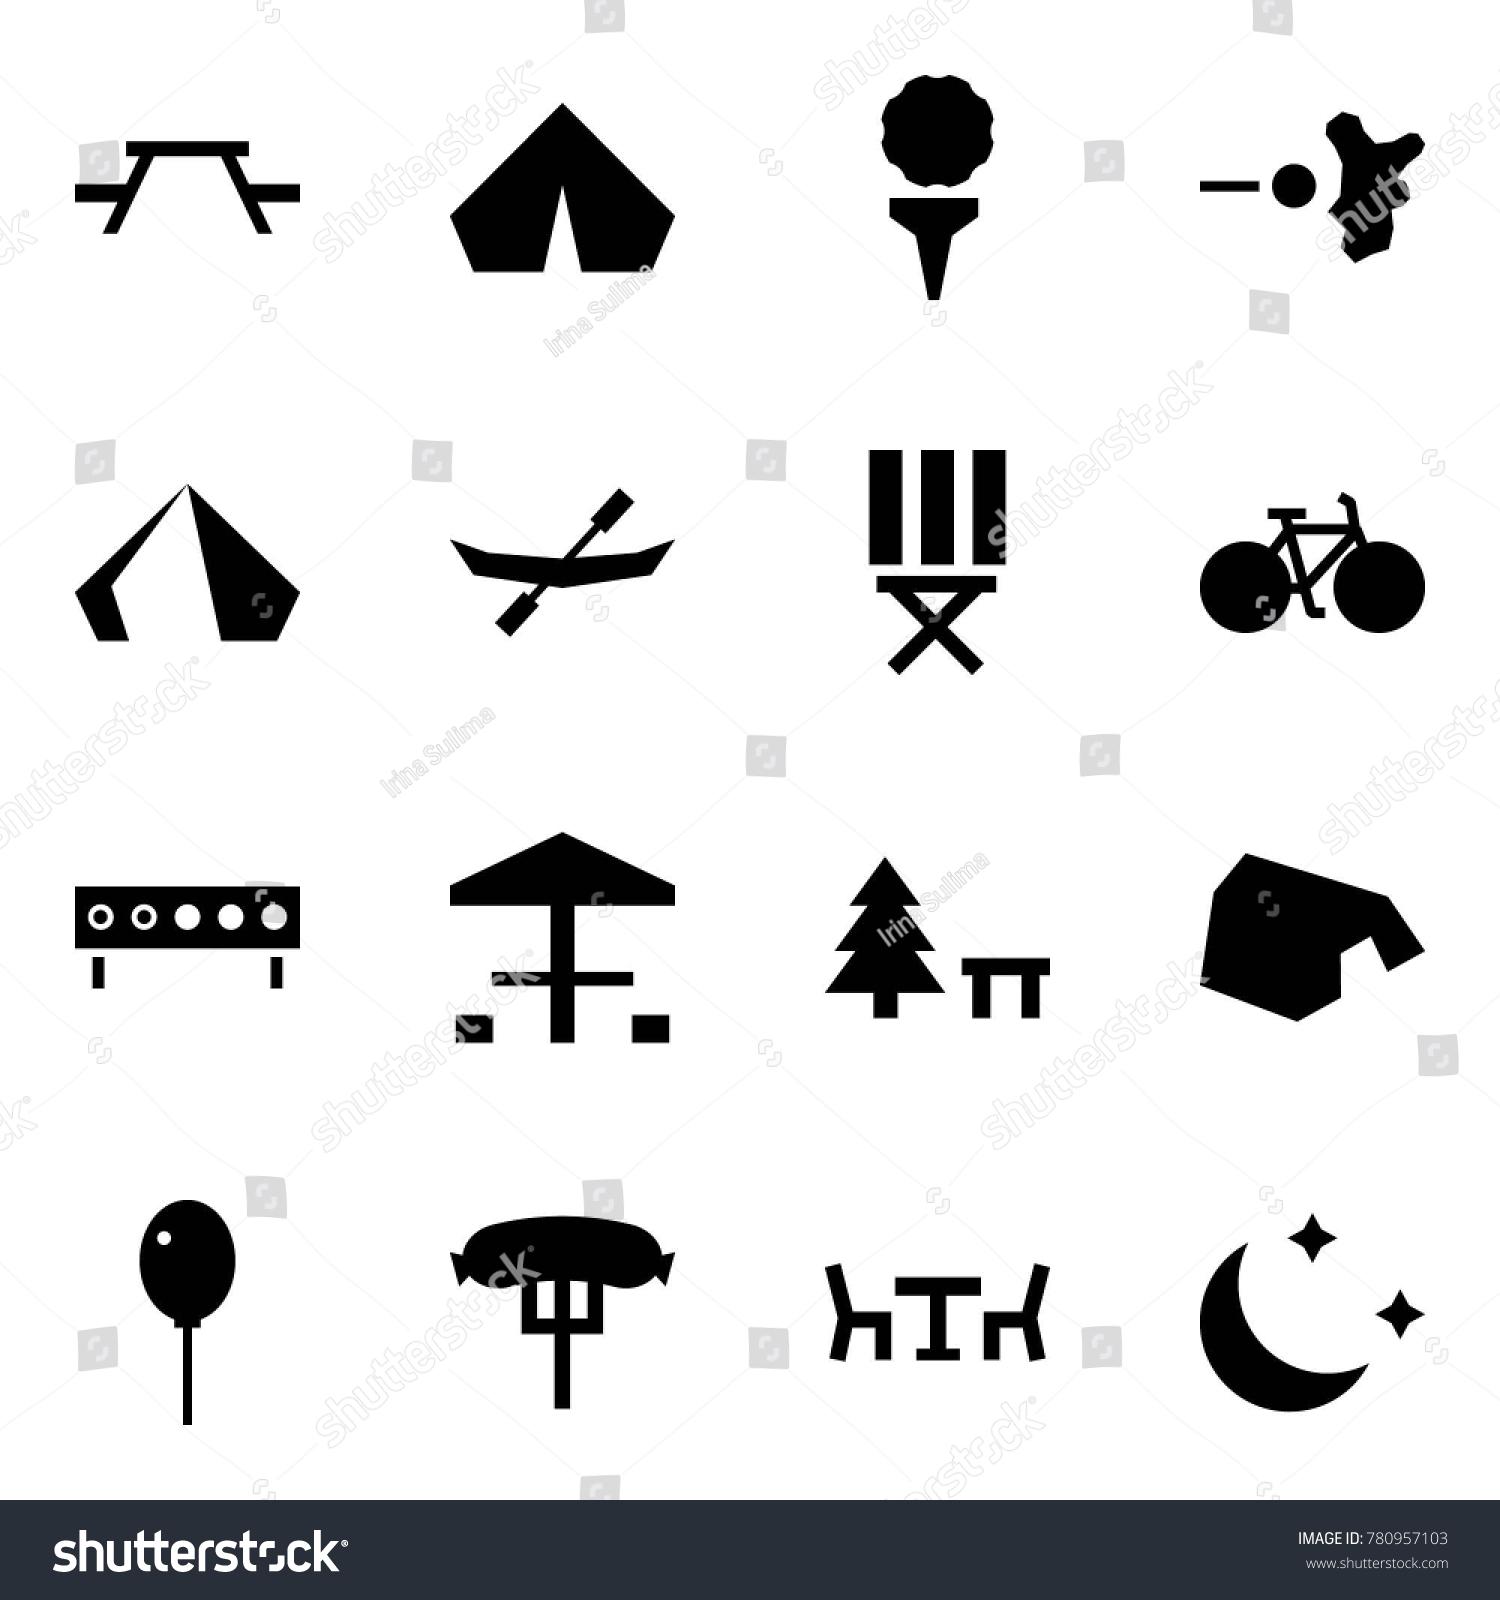 Origami style icon set picnic table stock vector 780957103 origami style icon set picnic table stock vector 780957103 shutterstock biocorpaavc